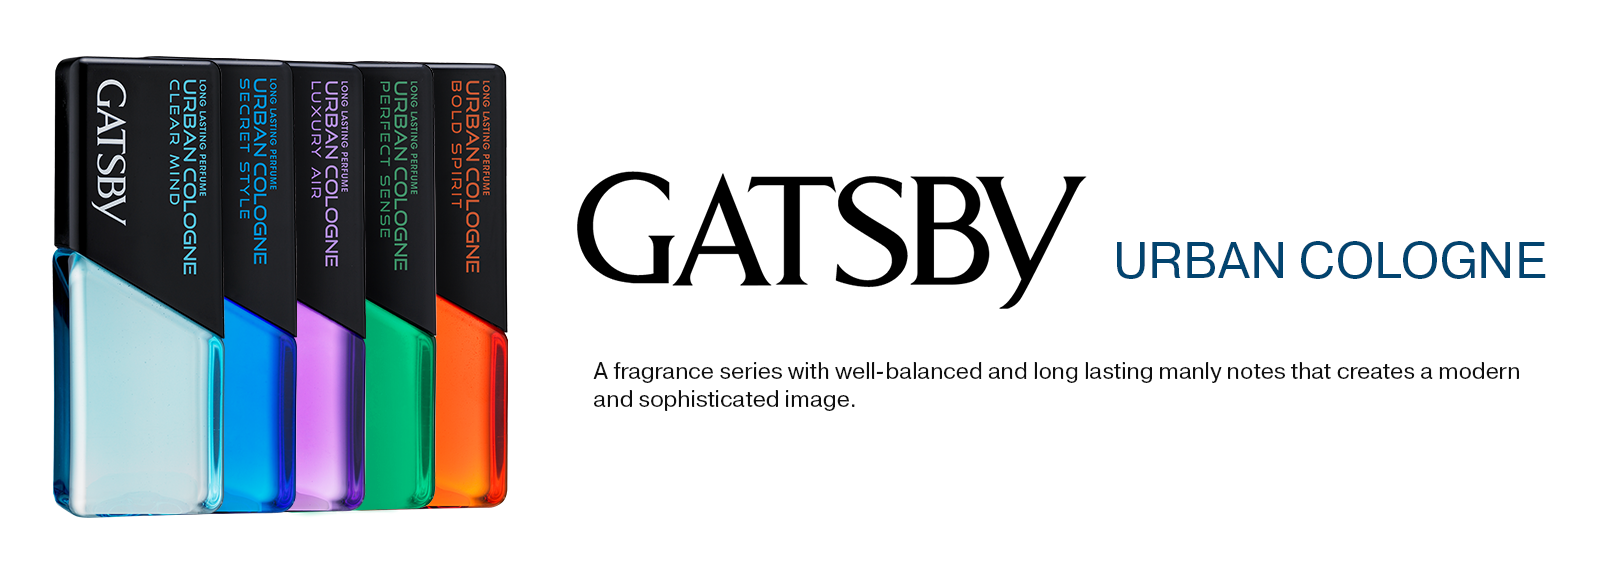 GATSBY COLOGNE